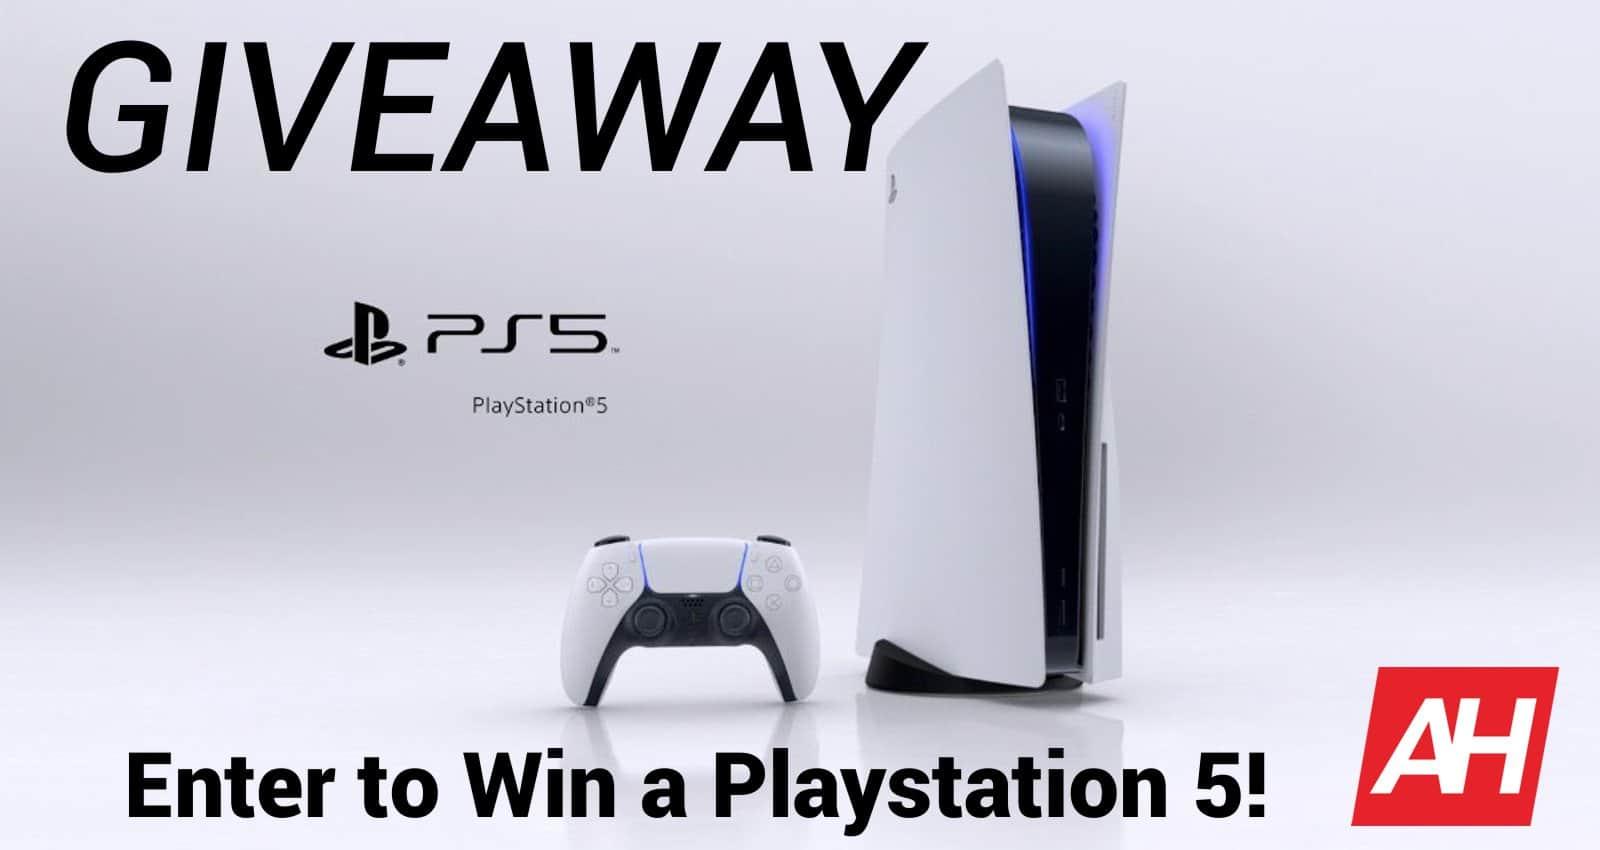 Playstation 5 Giveaway AndroidHeadlines 2